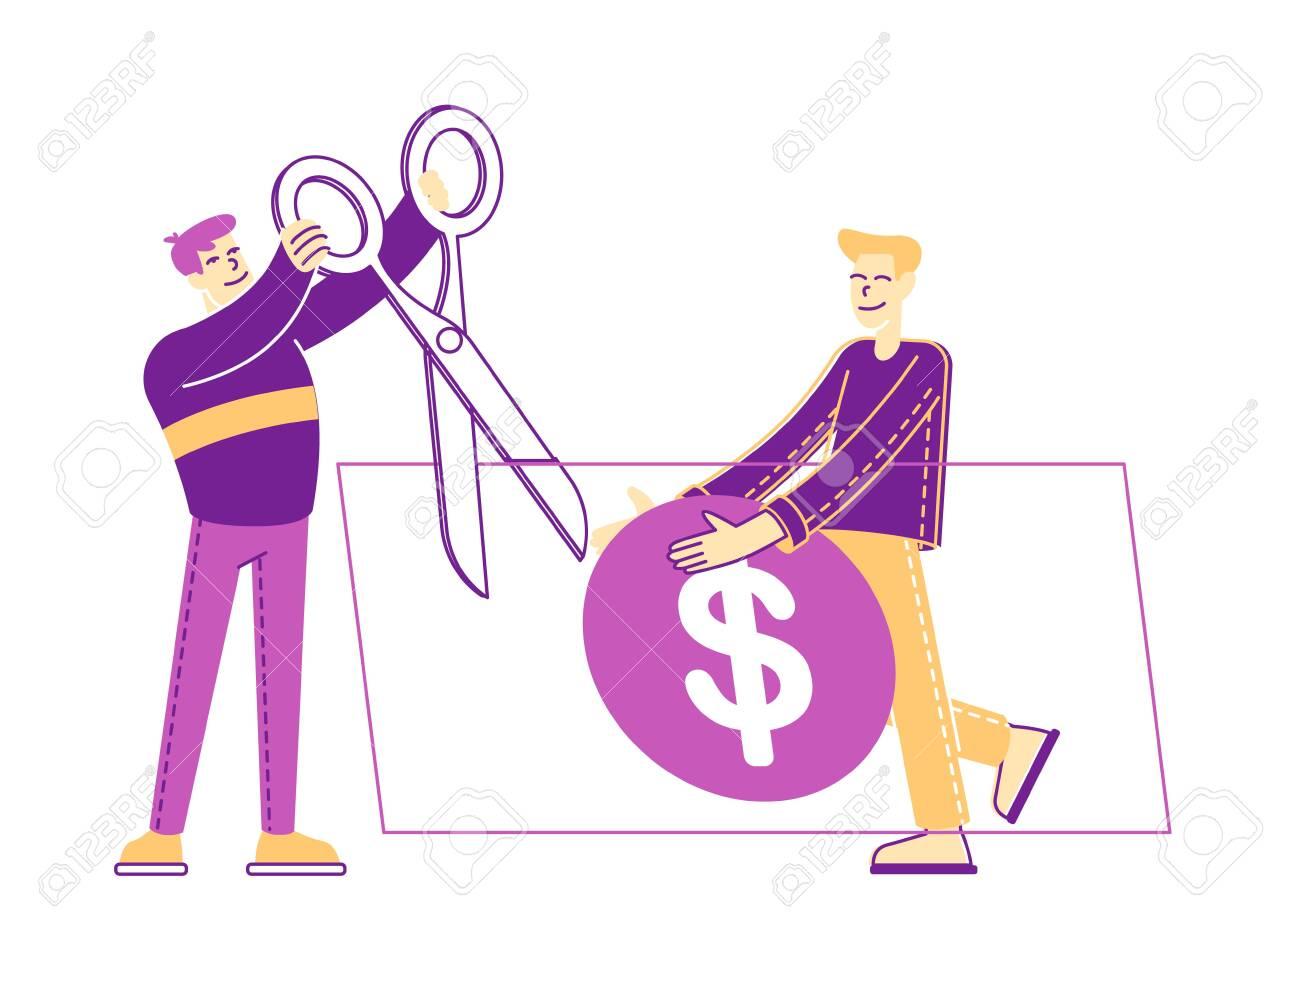 Cost Icon clipart - Line, Font, Hand, transparent clip art